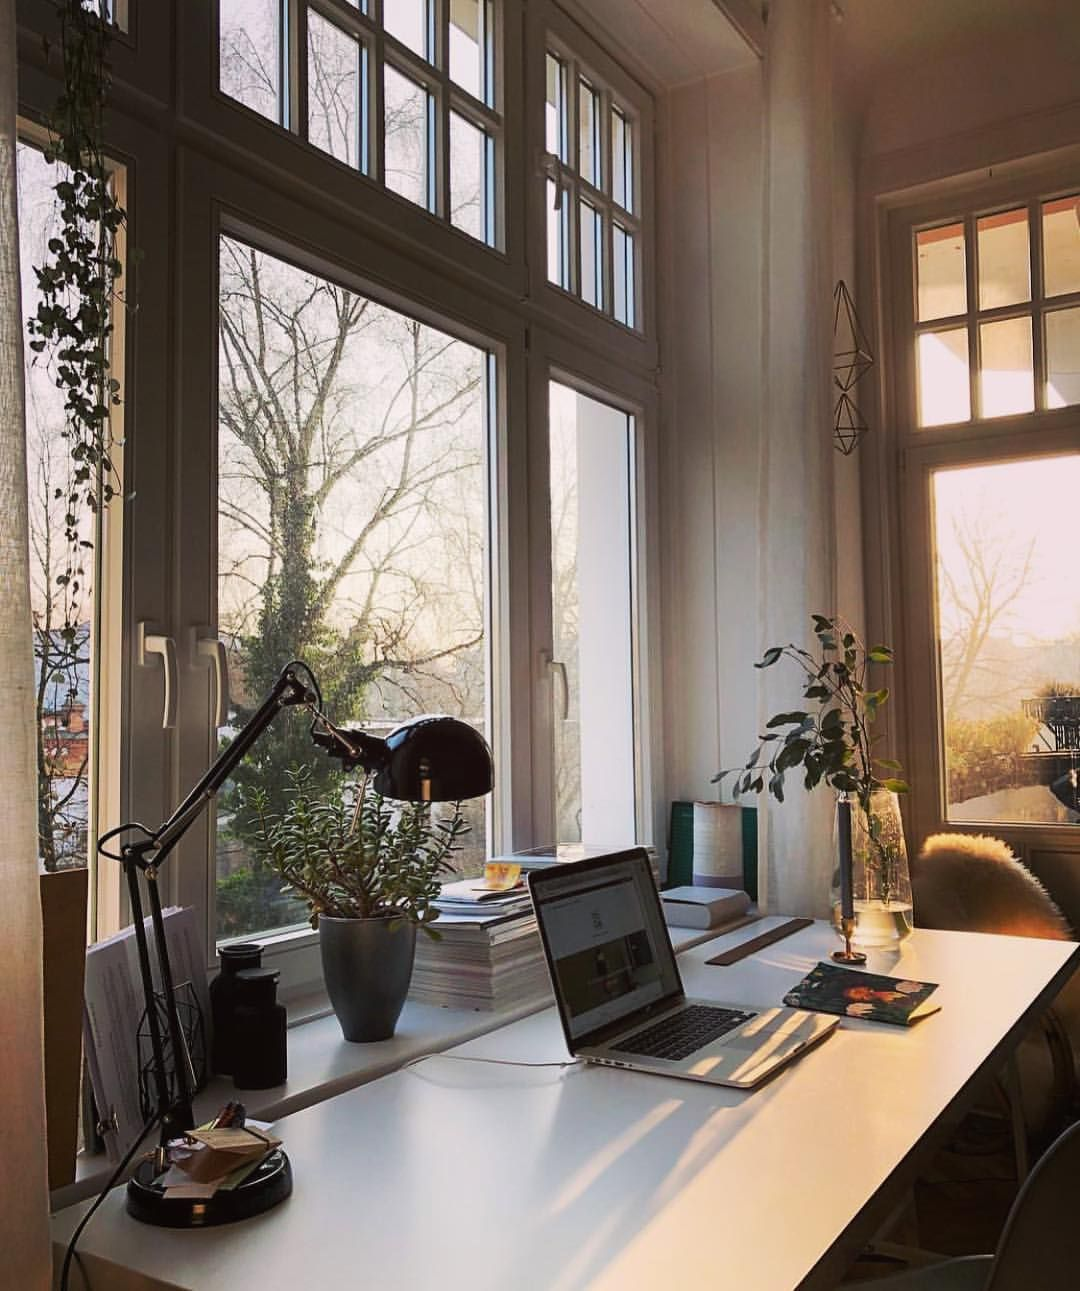 Desk under window ideas  pin by janet bugarin on windows  pinterest  interiors study hard